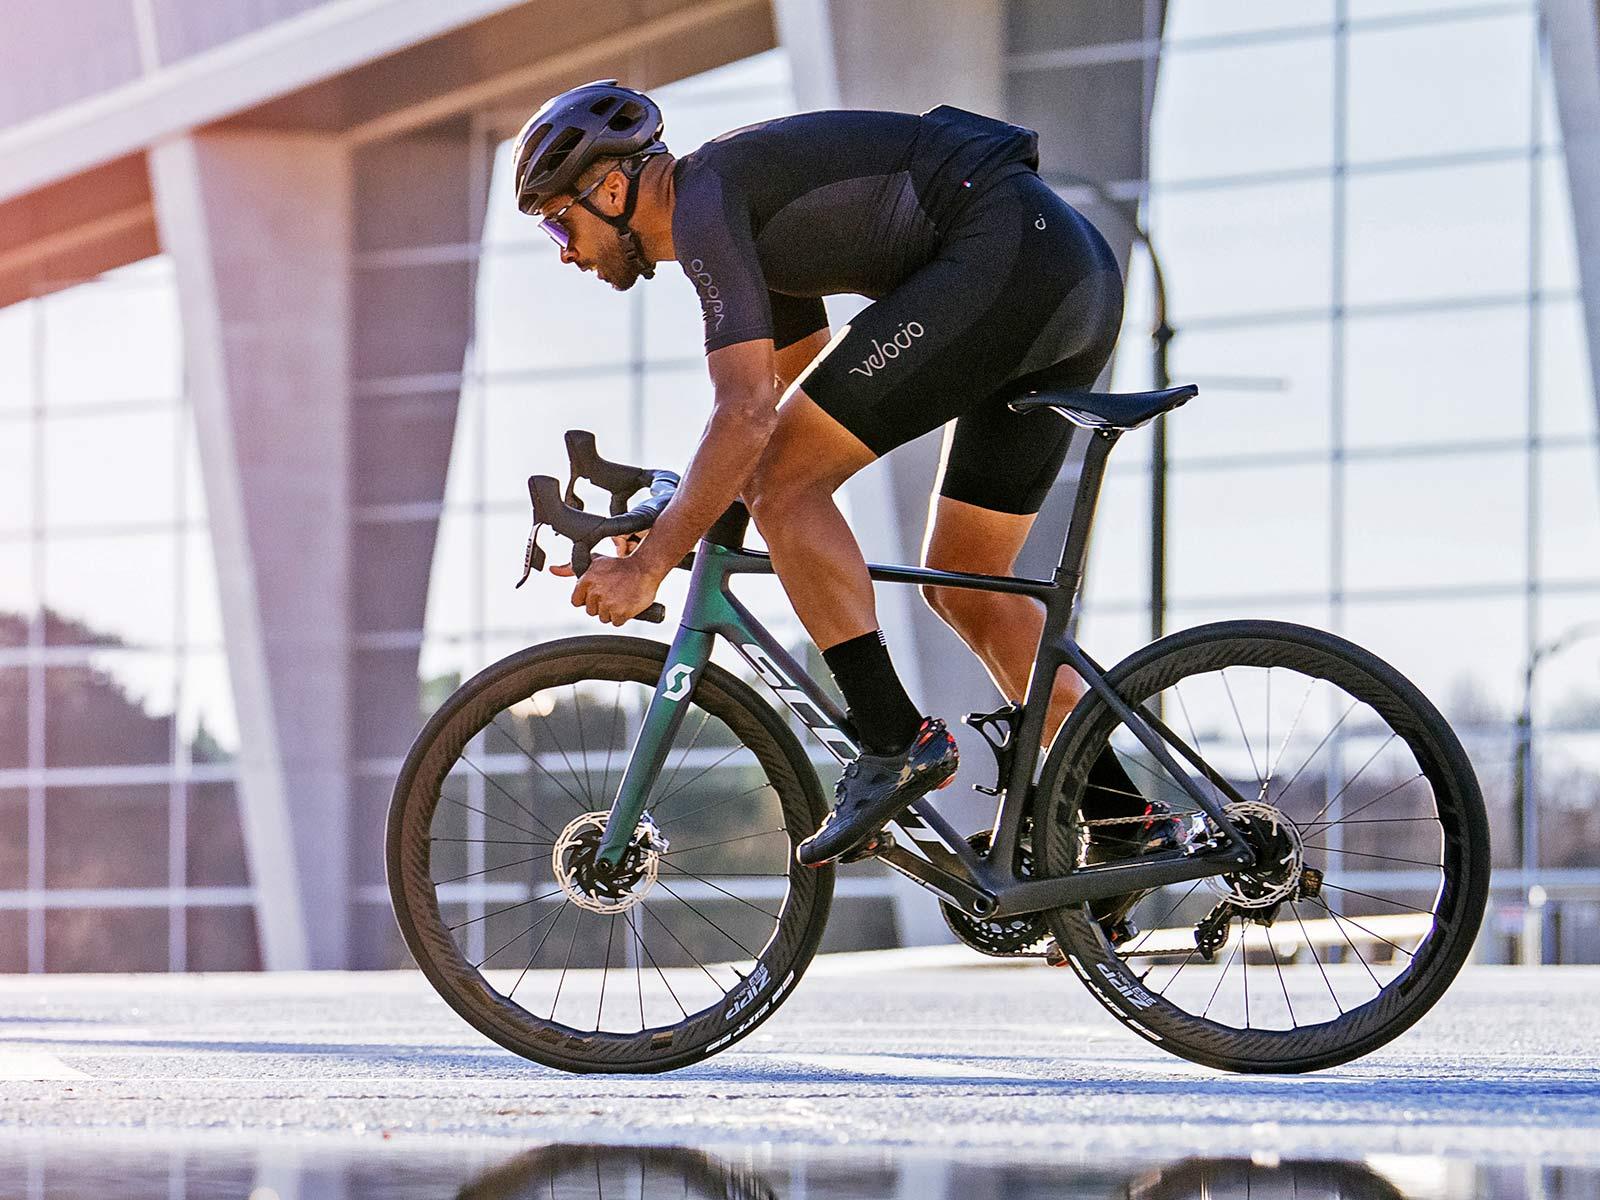 Zipp 353 NSW tubeless wheels, ultra-wide 25mm internal hookless tubeless carbon disc brake road bike wheelset,riding